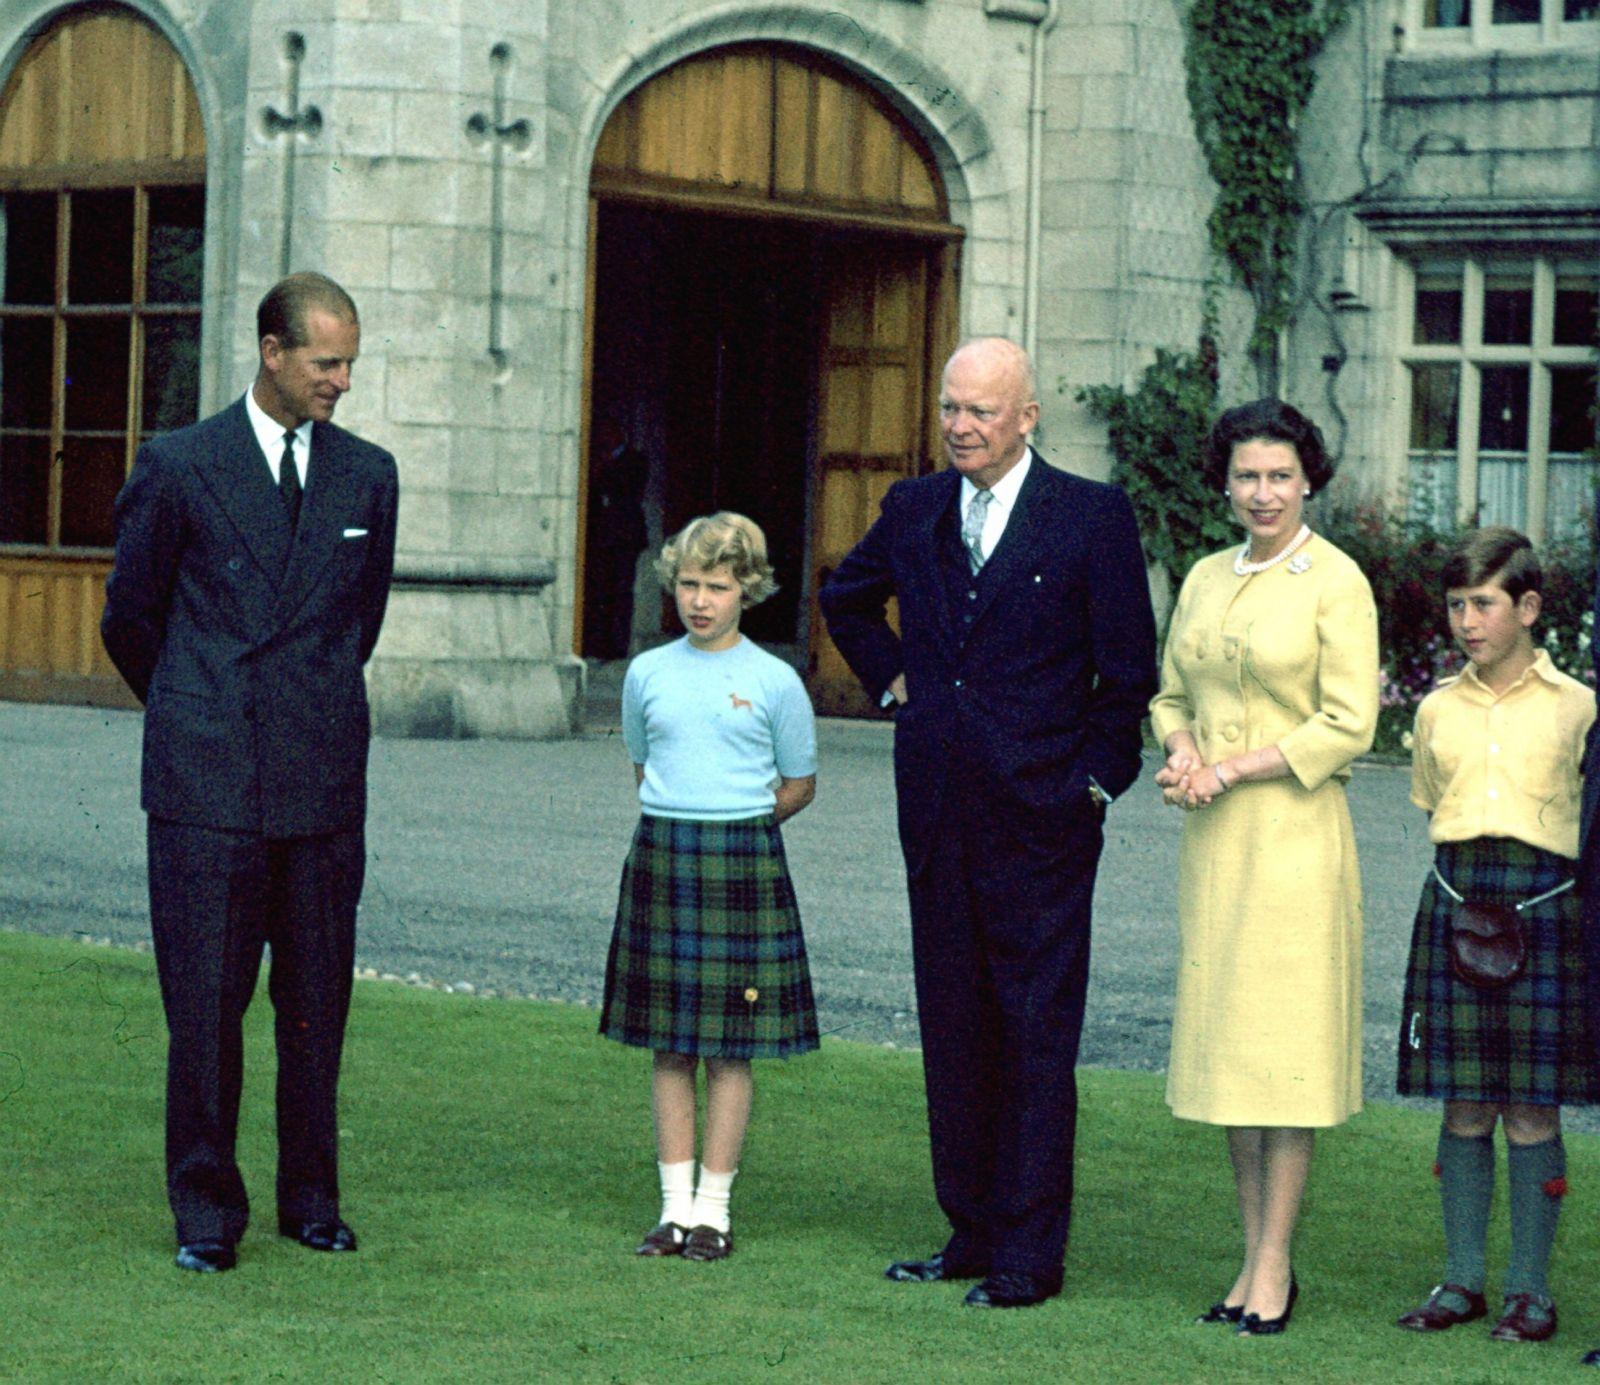 Queen Elizabeth And U.S. Presidents - ABC News